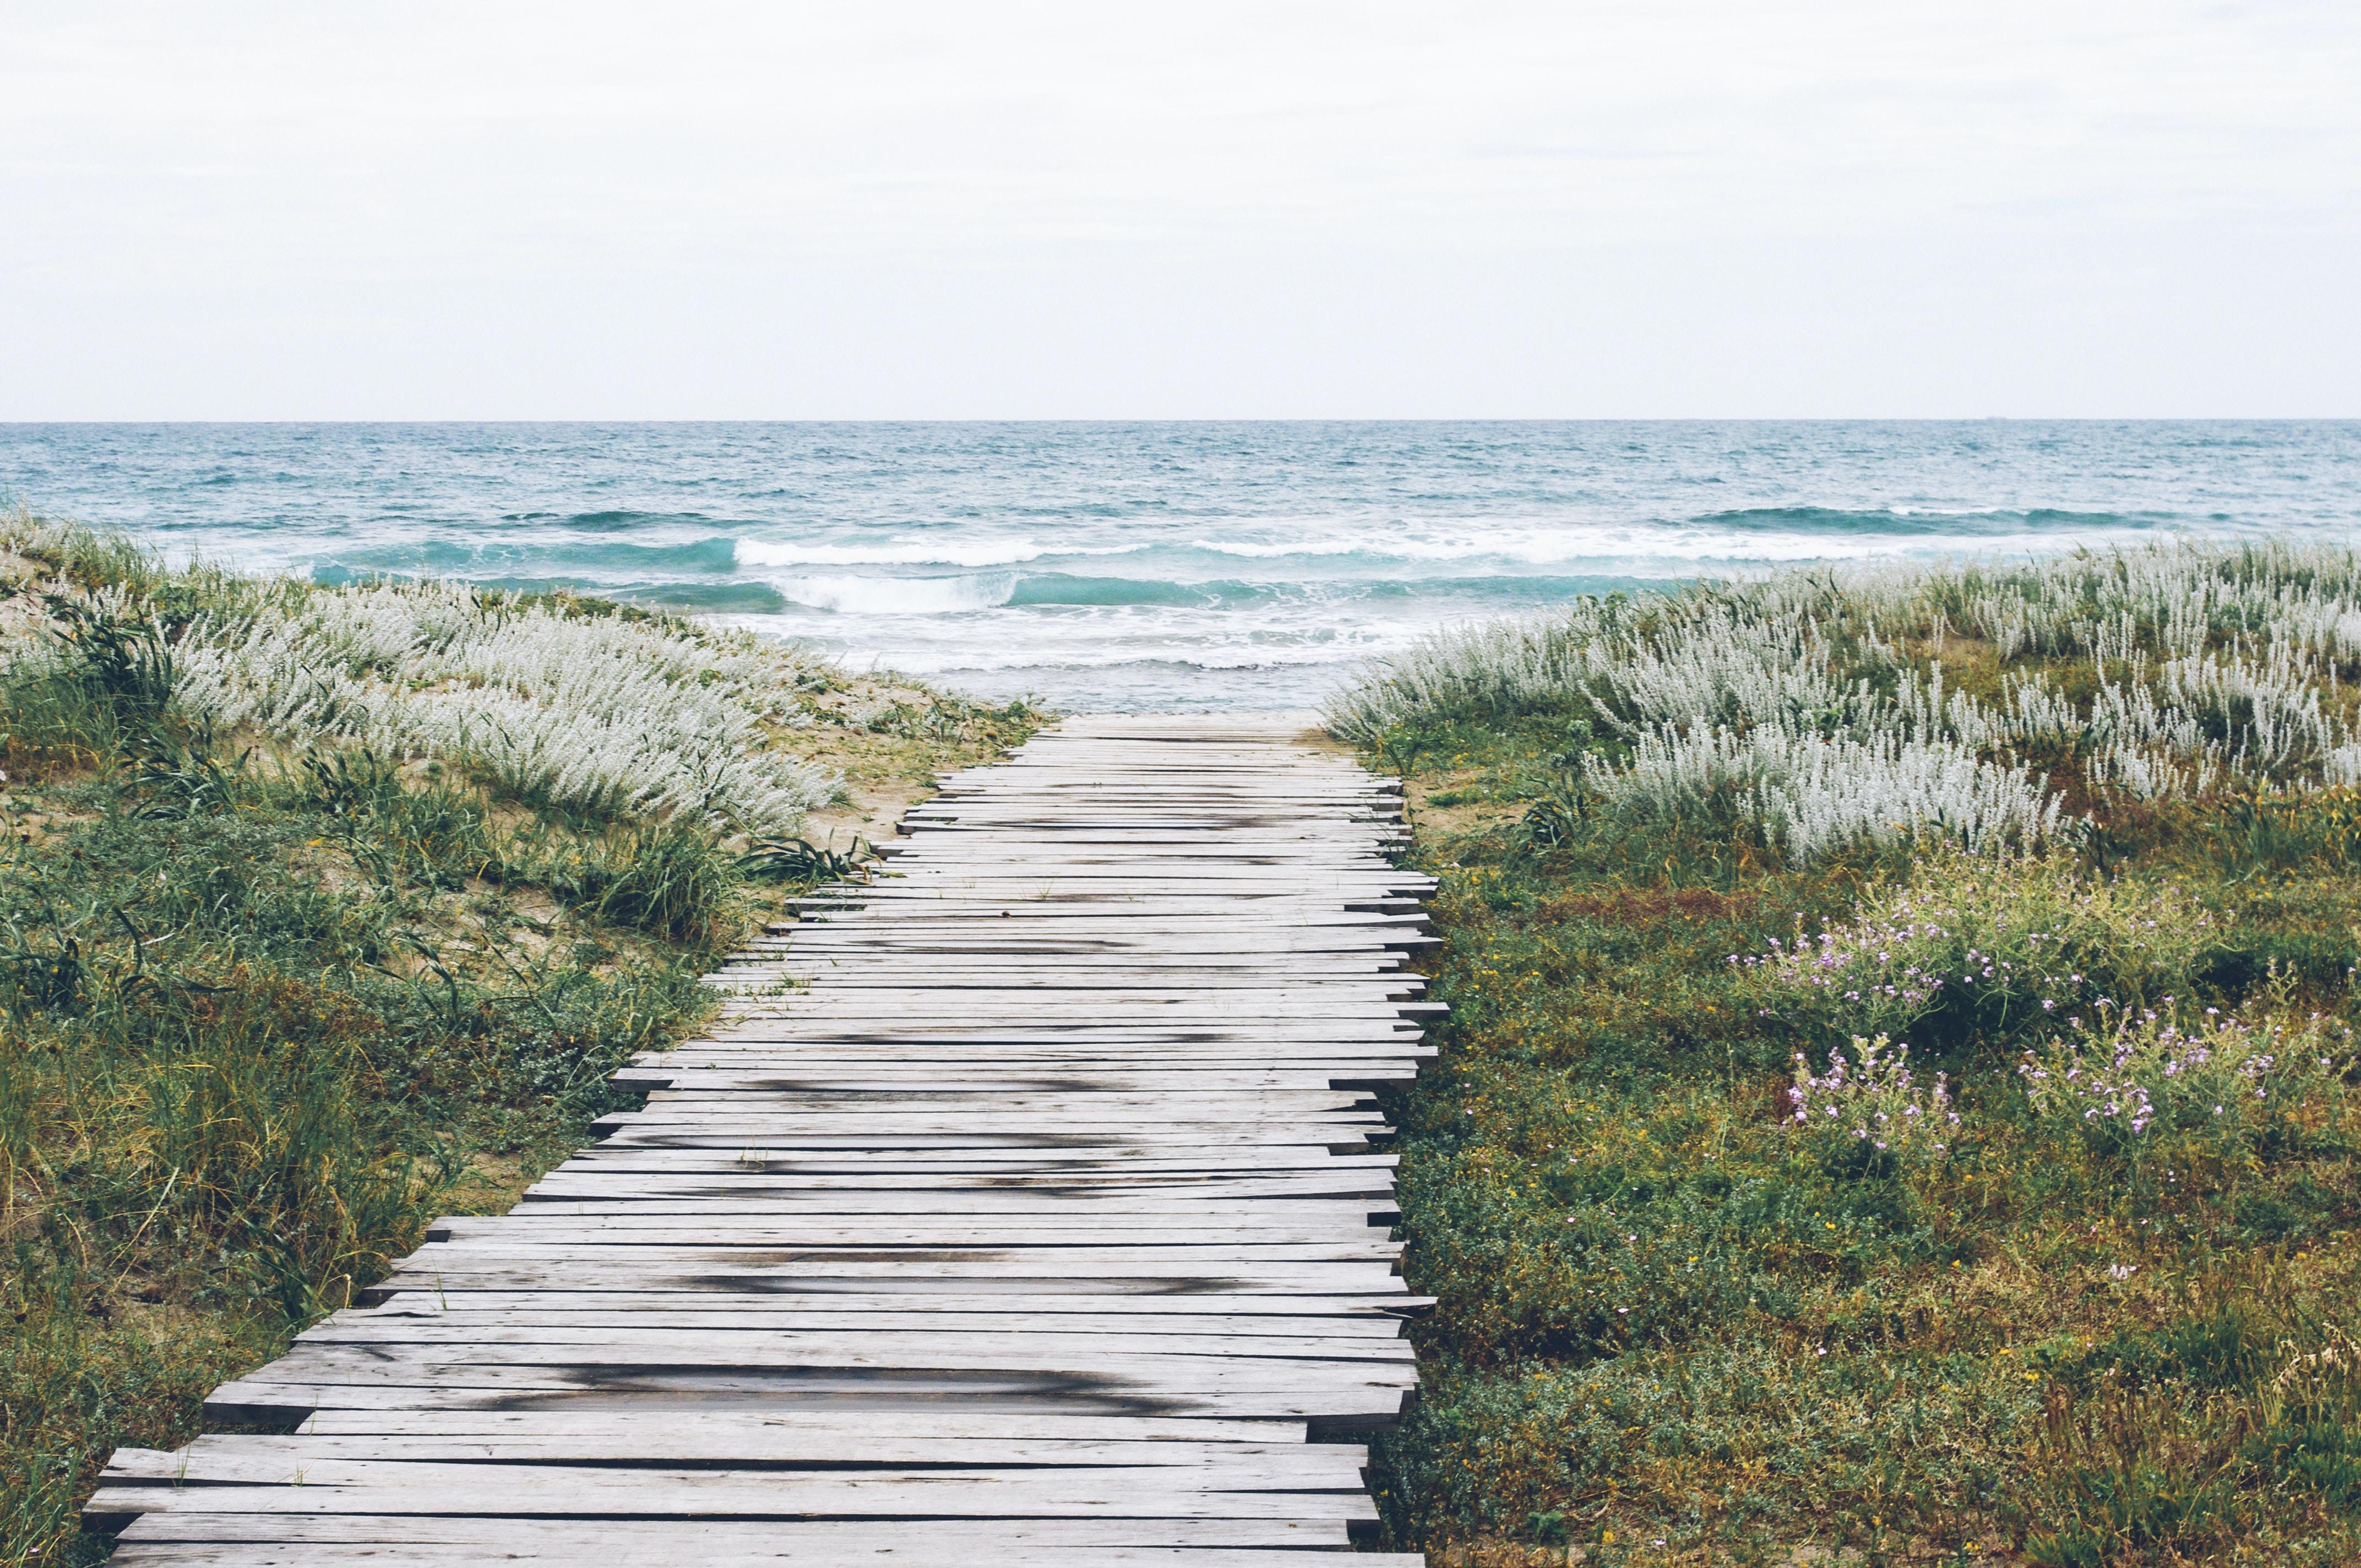 Wooden path through the grass toward the ocean beach